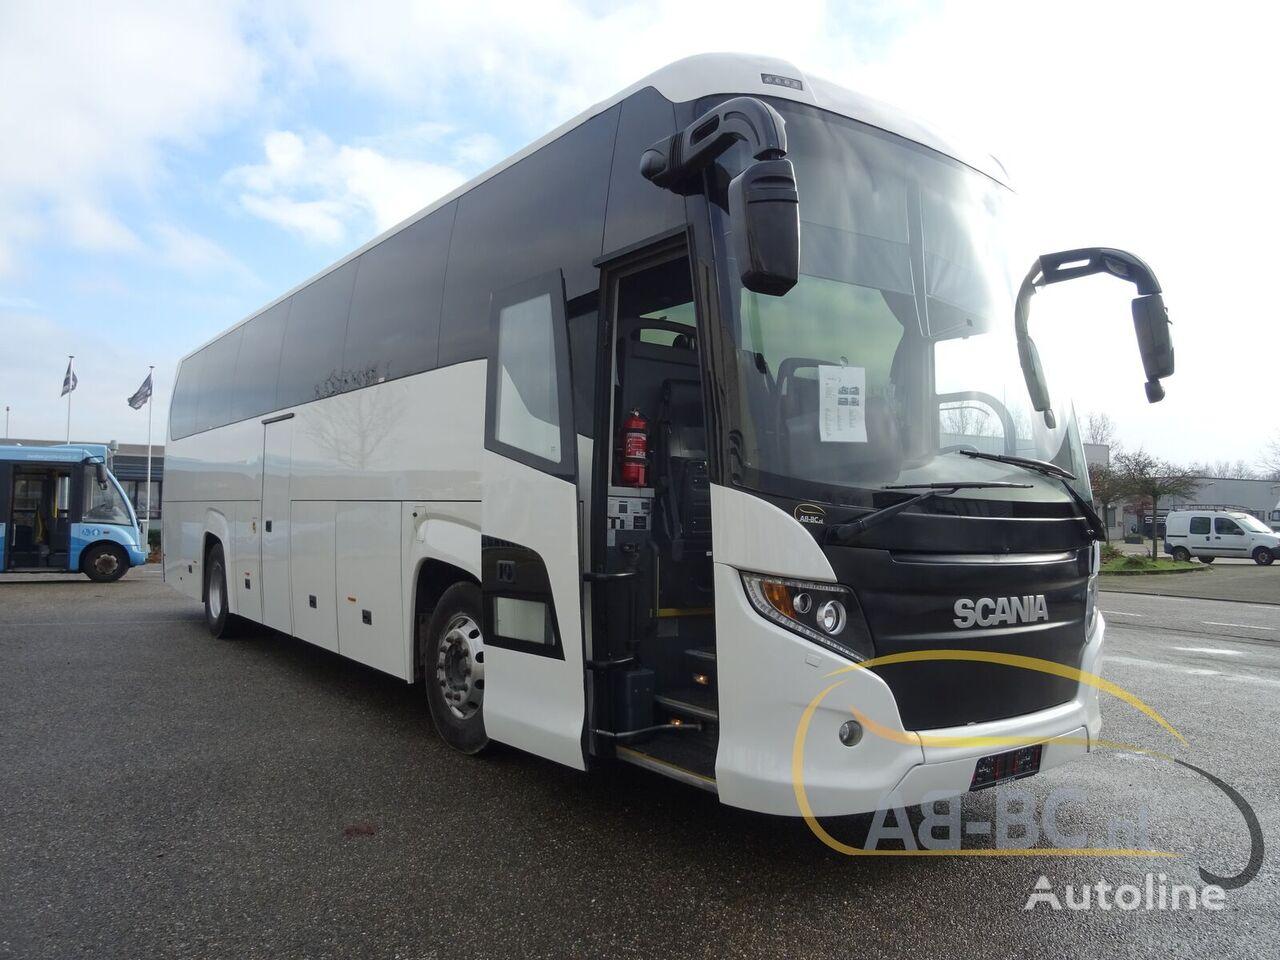 SCANIA Higer Touring 49+1+1 EURO 6 coach bus